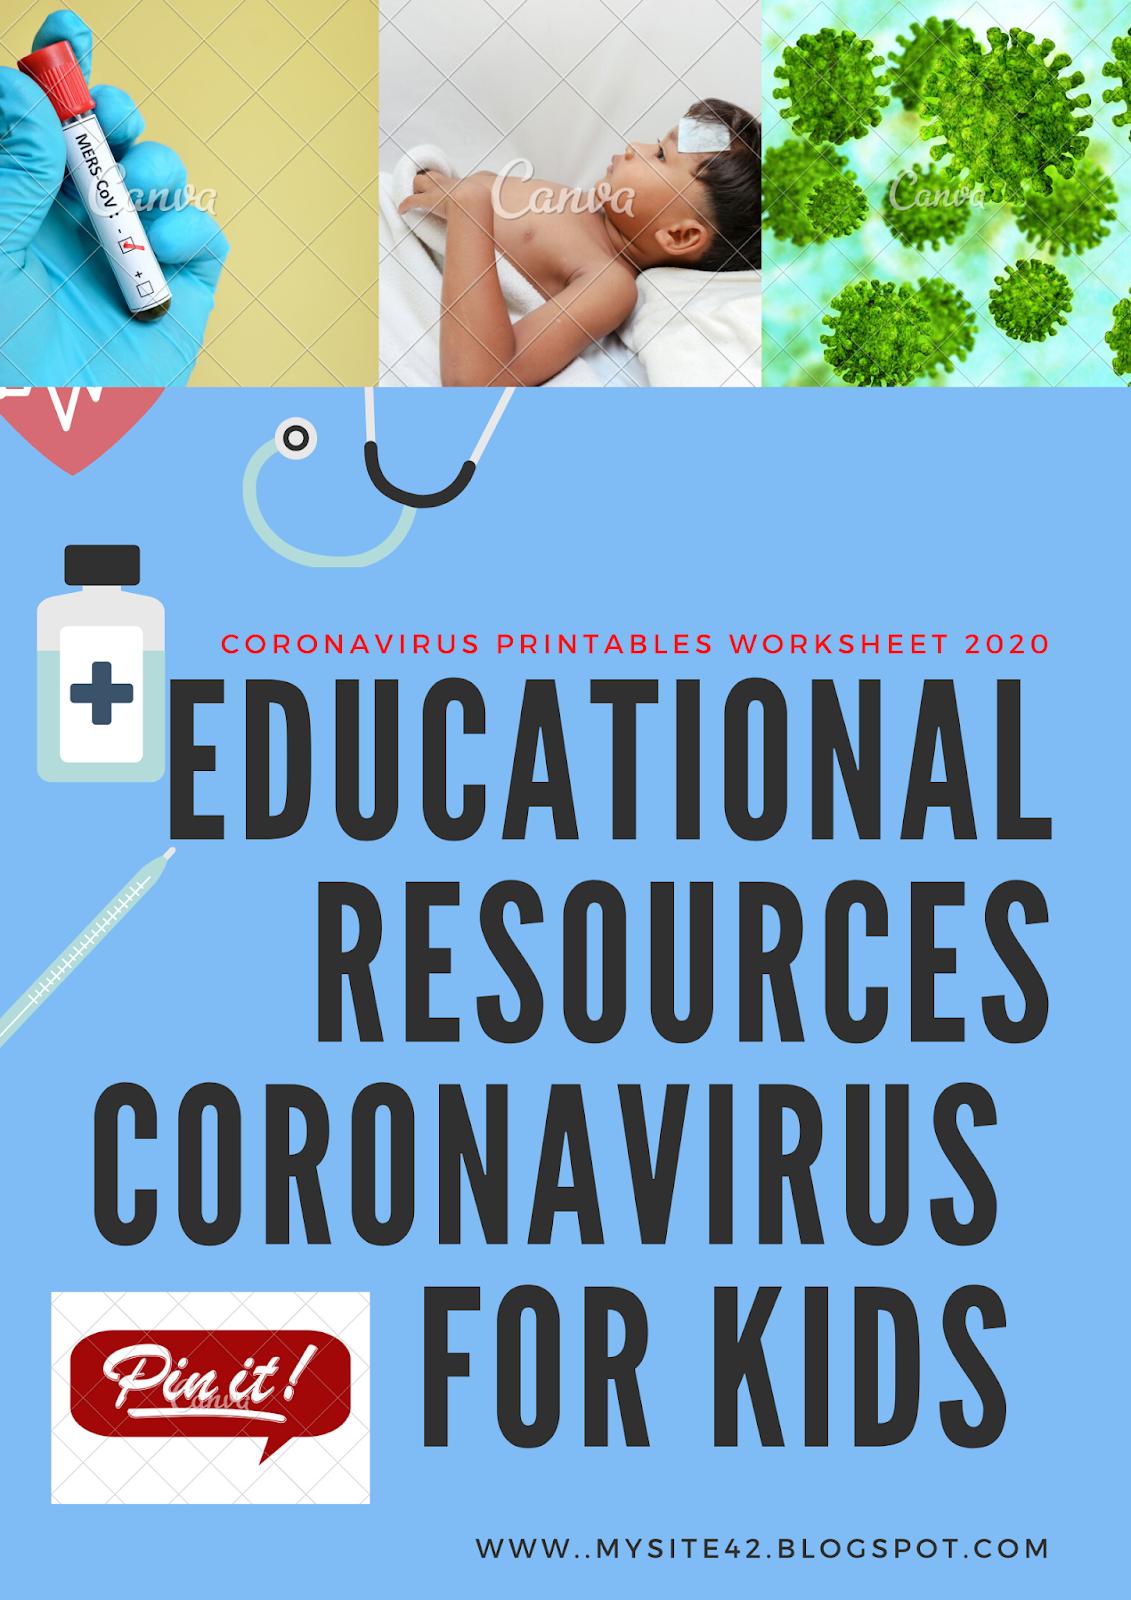 Educational Resources Coronavirus  for Kids Printables Worksheet 2020